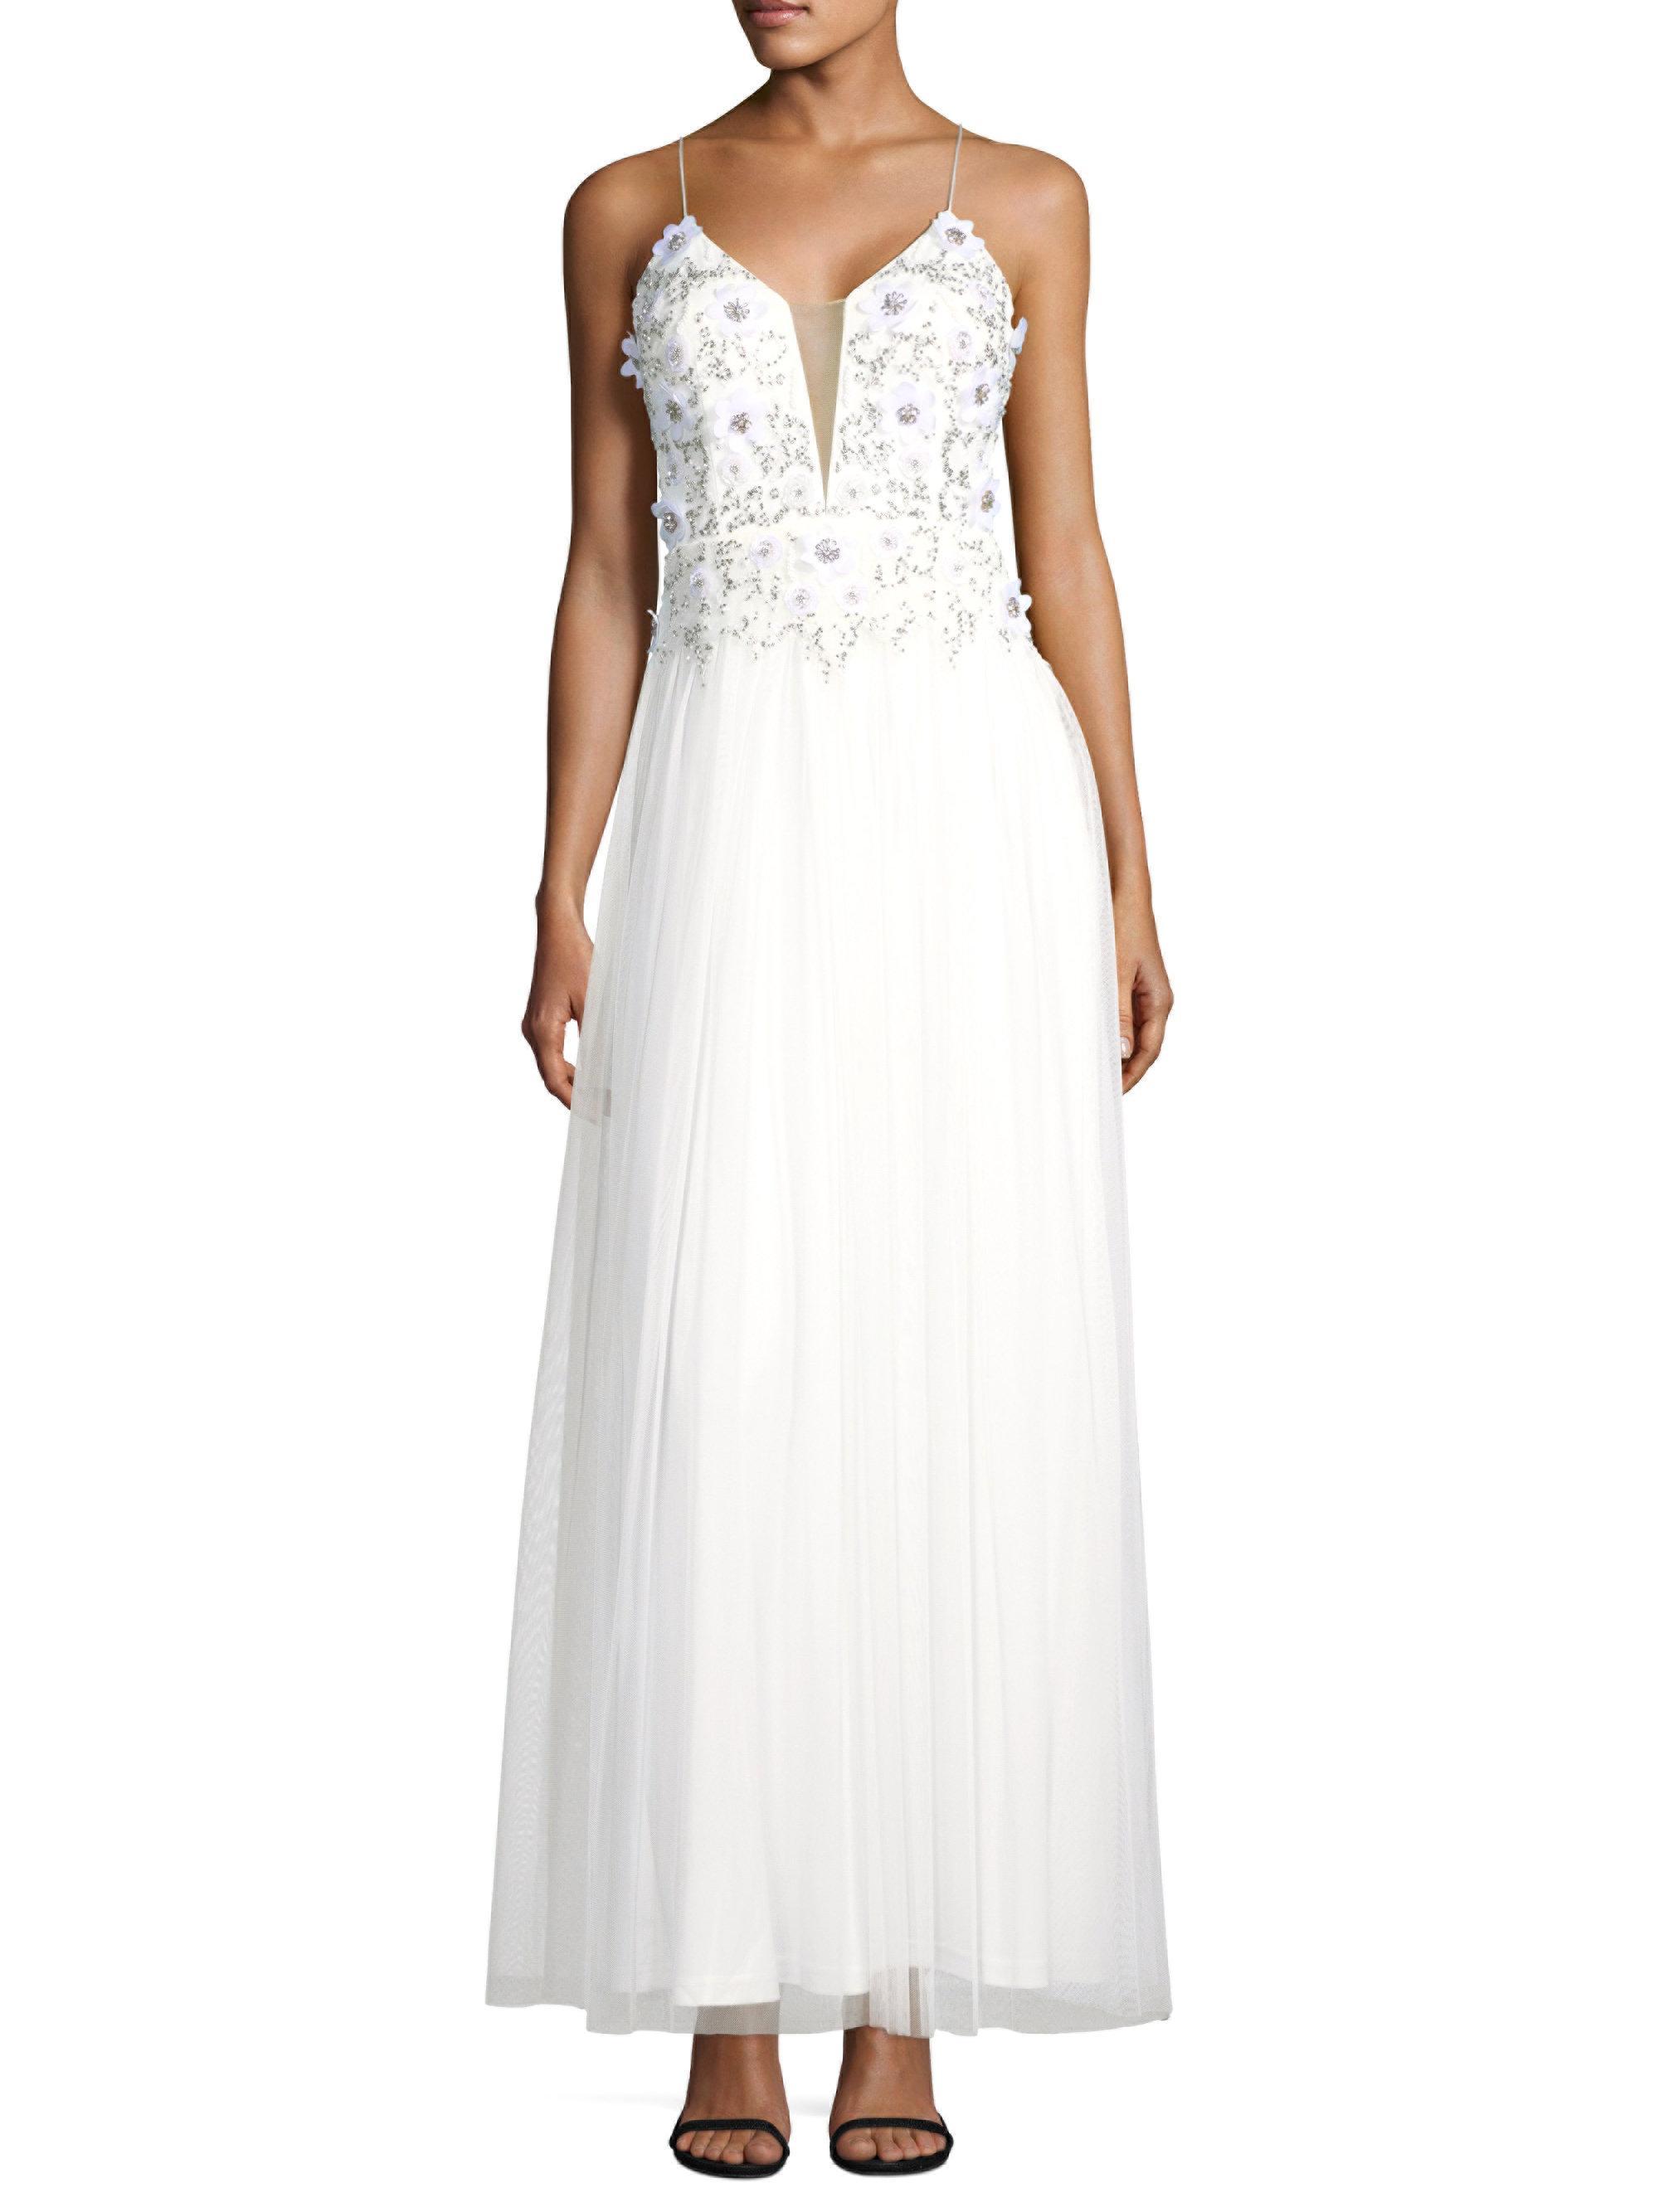 Lyst - Aidan Mattox Beaded Mesh Gown in White